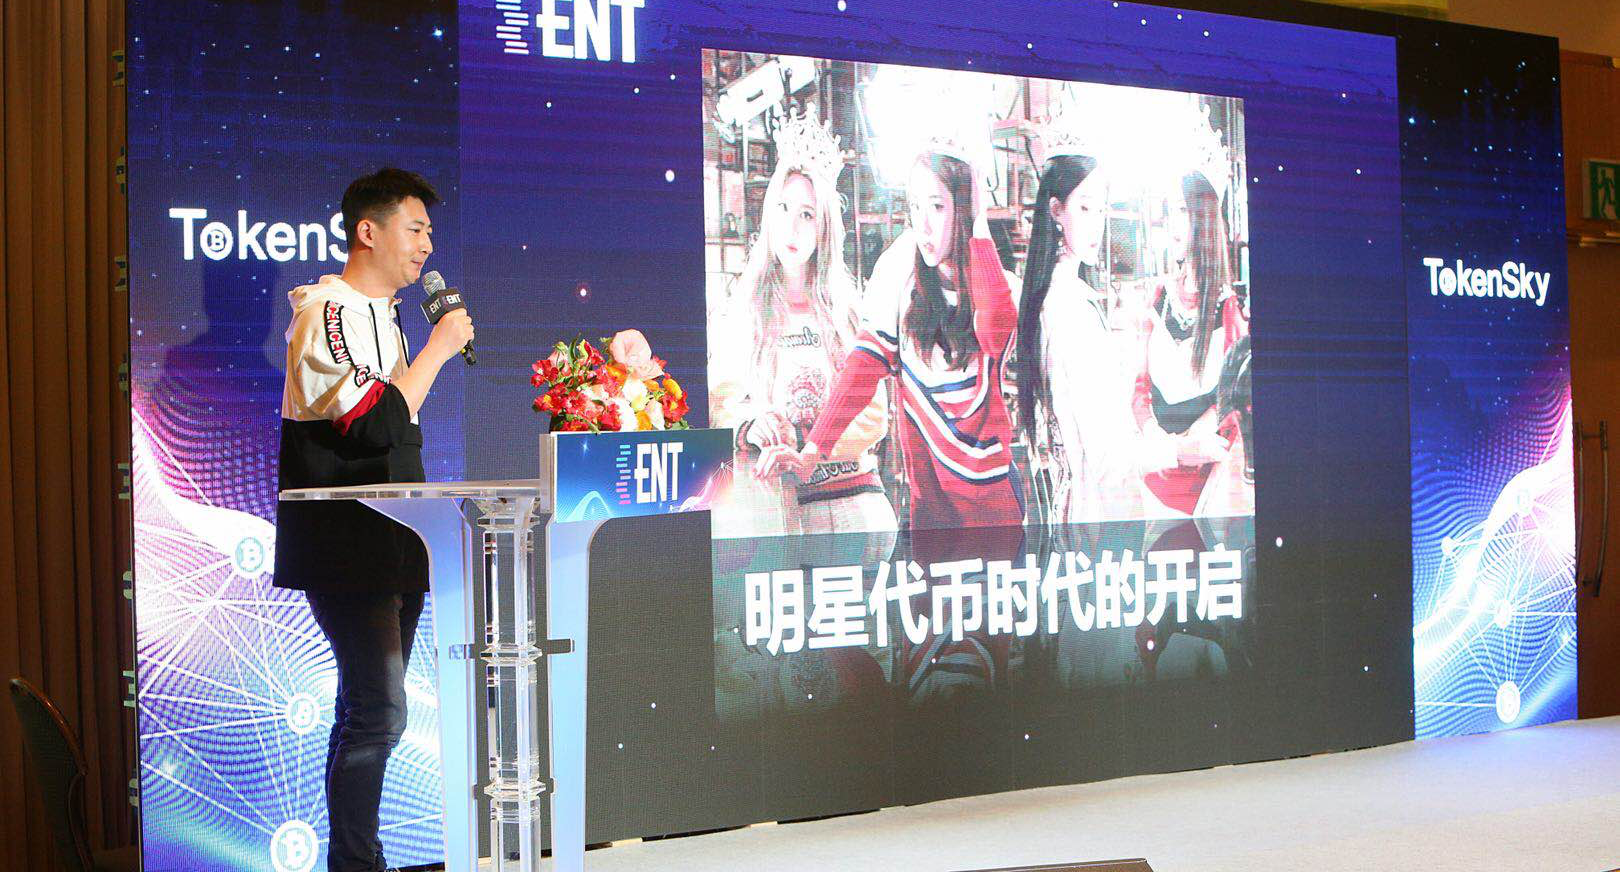 ENT娱乐链公布世界级智能内容区块链方案 区块链技术有望在娱乐行业率先落地应用